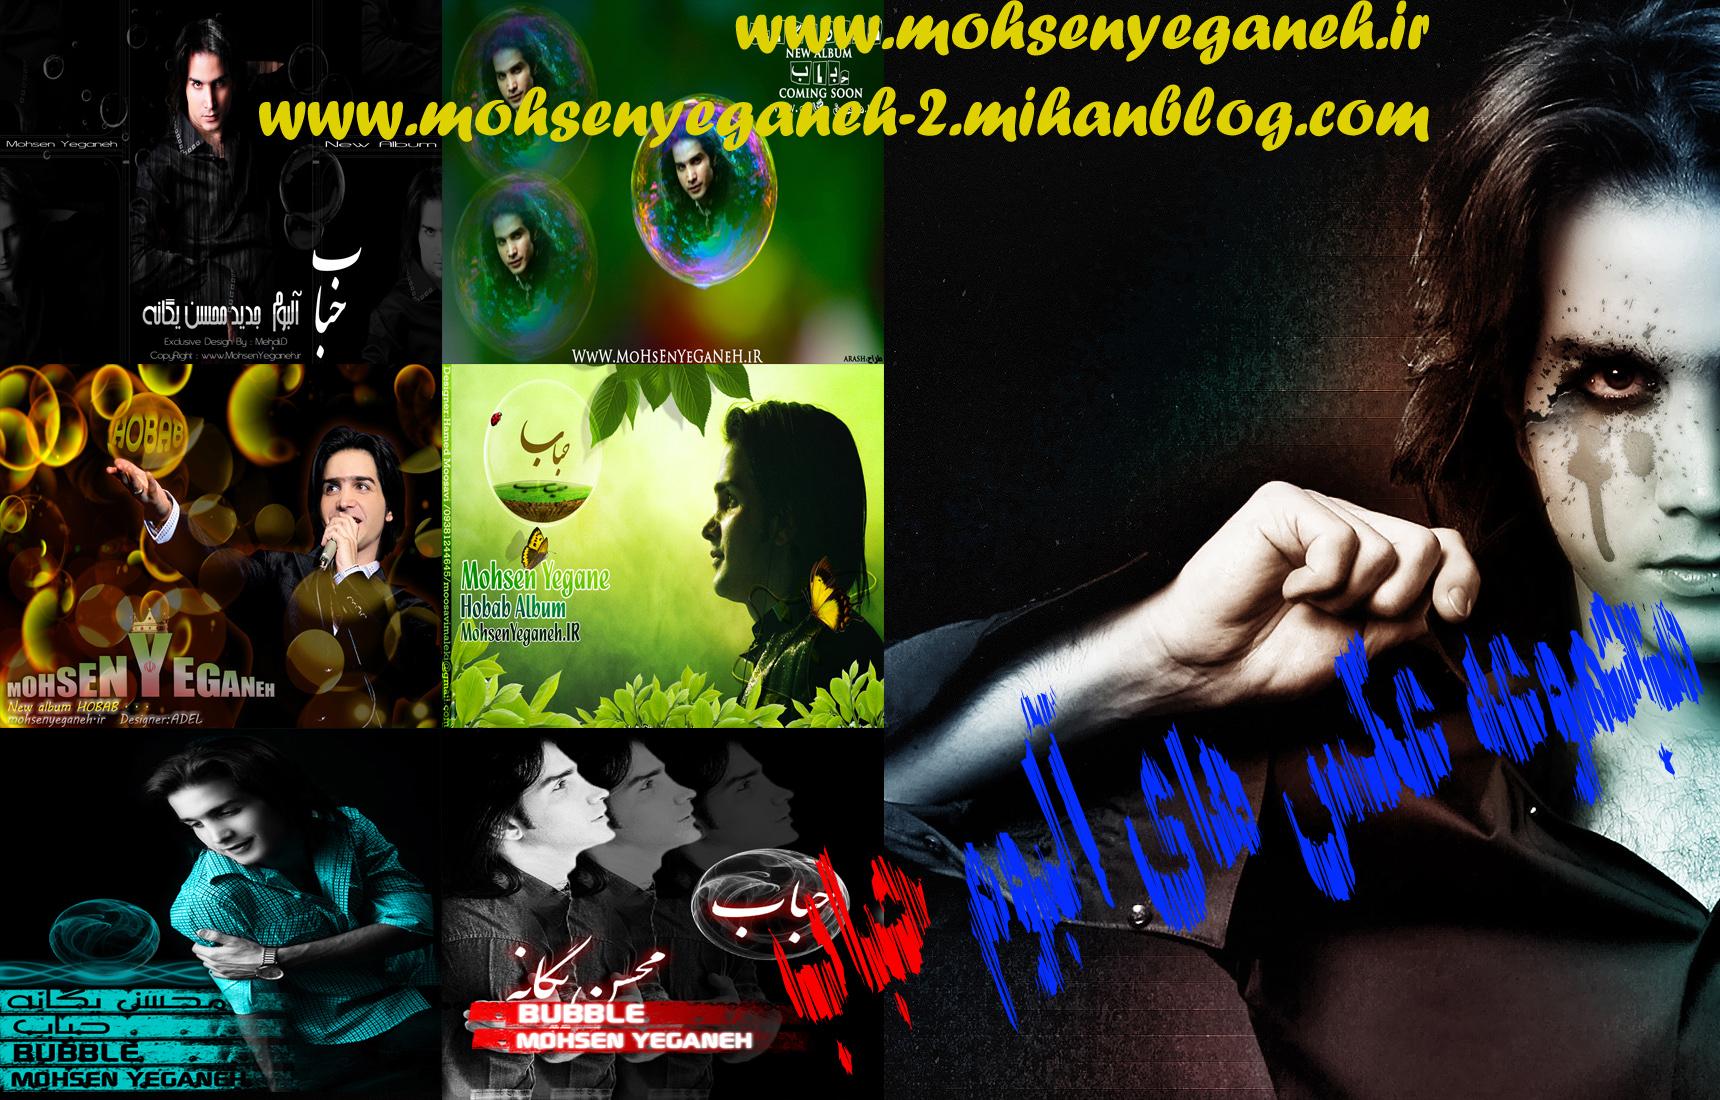 http://s2.picofile.com/file/7171512468/Mohsen_Yeganeh_ir_1.jpg